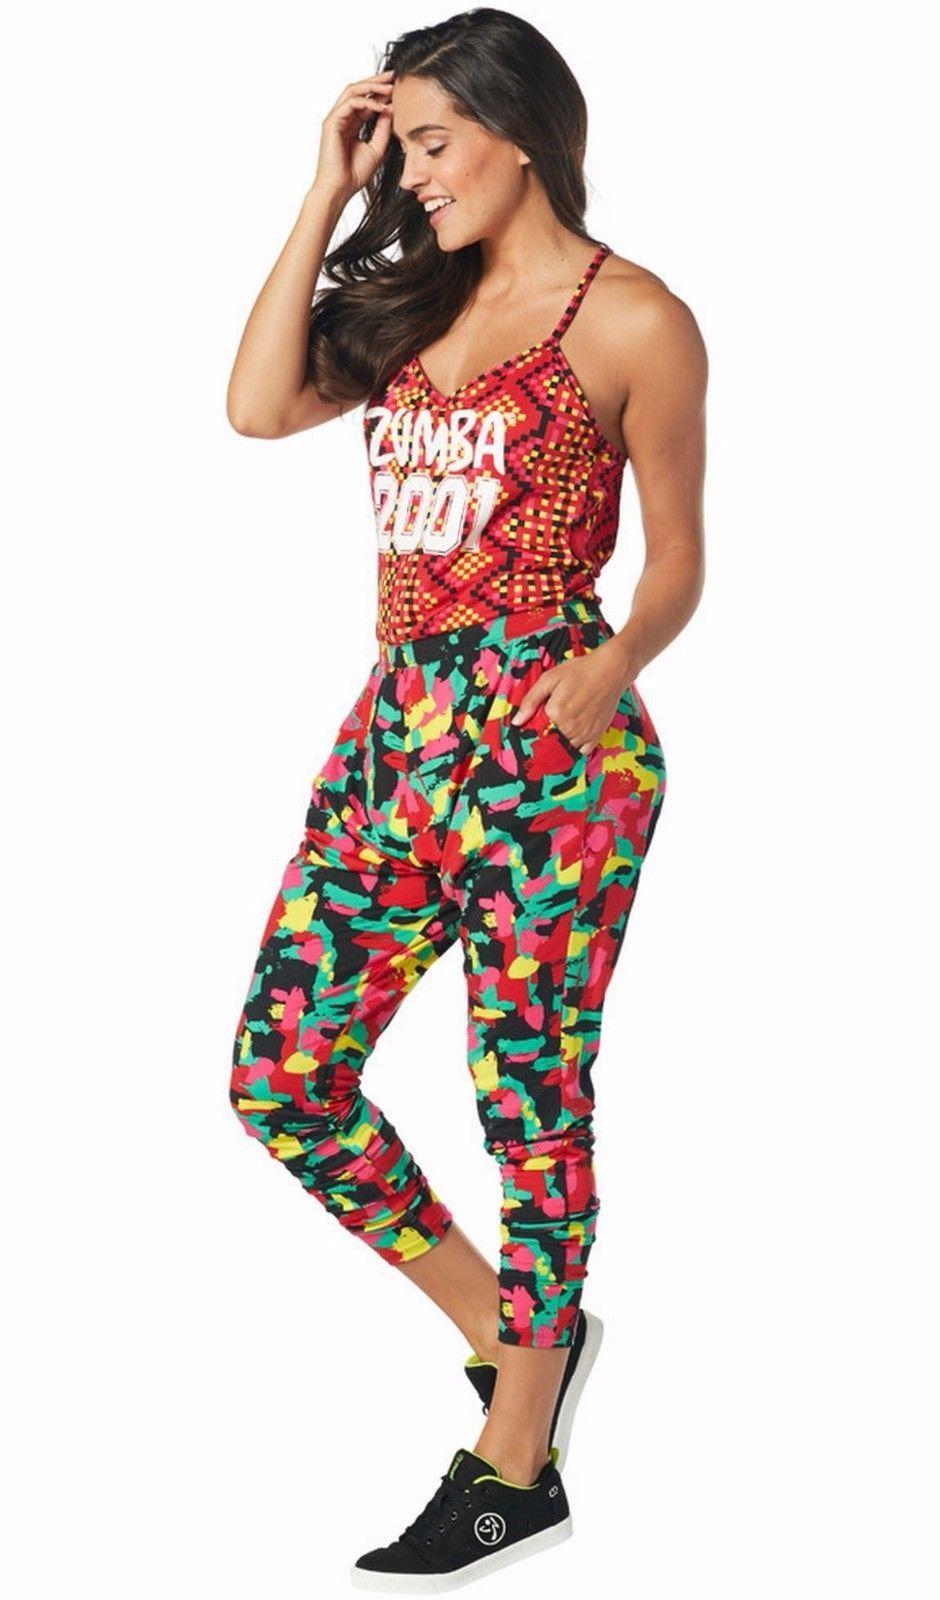 Zumba Rings  ebay  Fashion  a9d30e6e09d